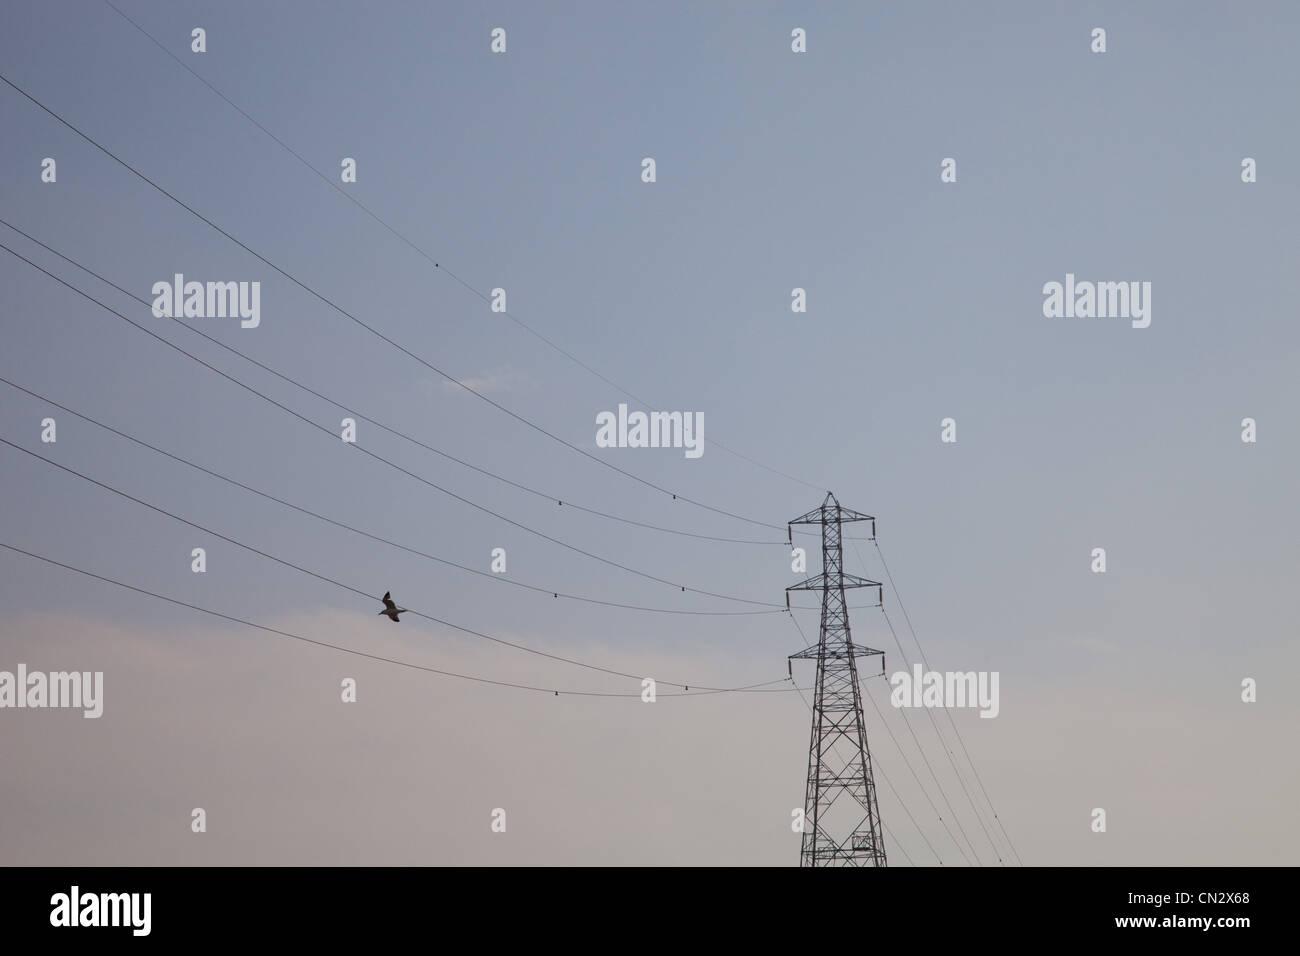 Bird flying near power lines - Stock Image